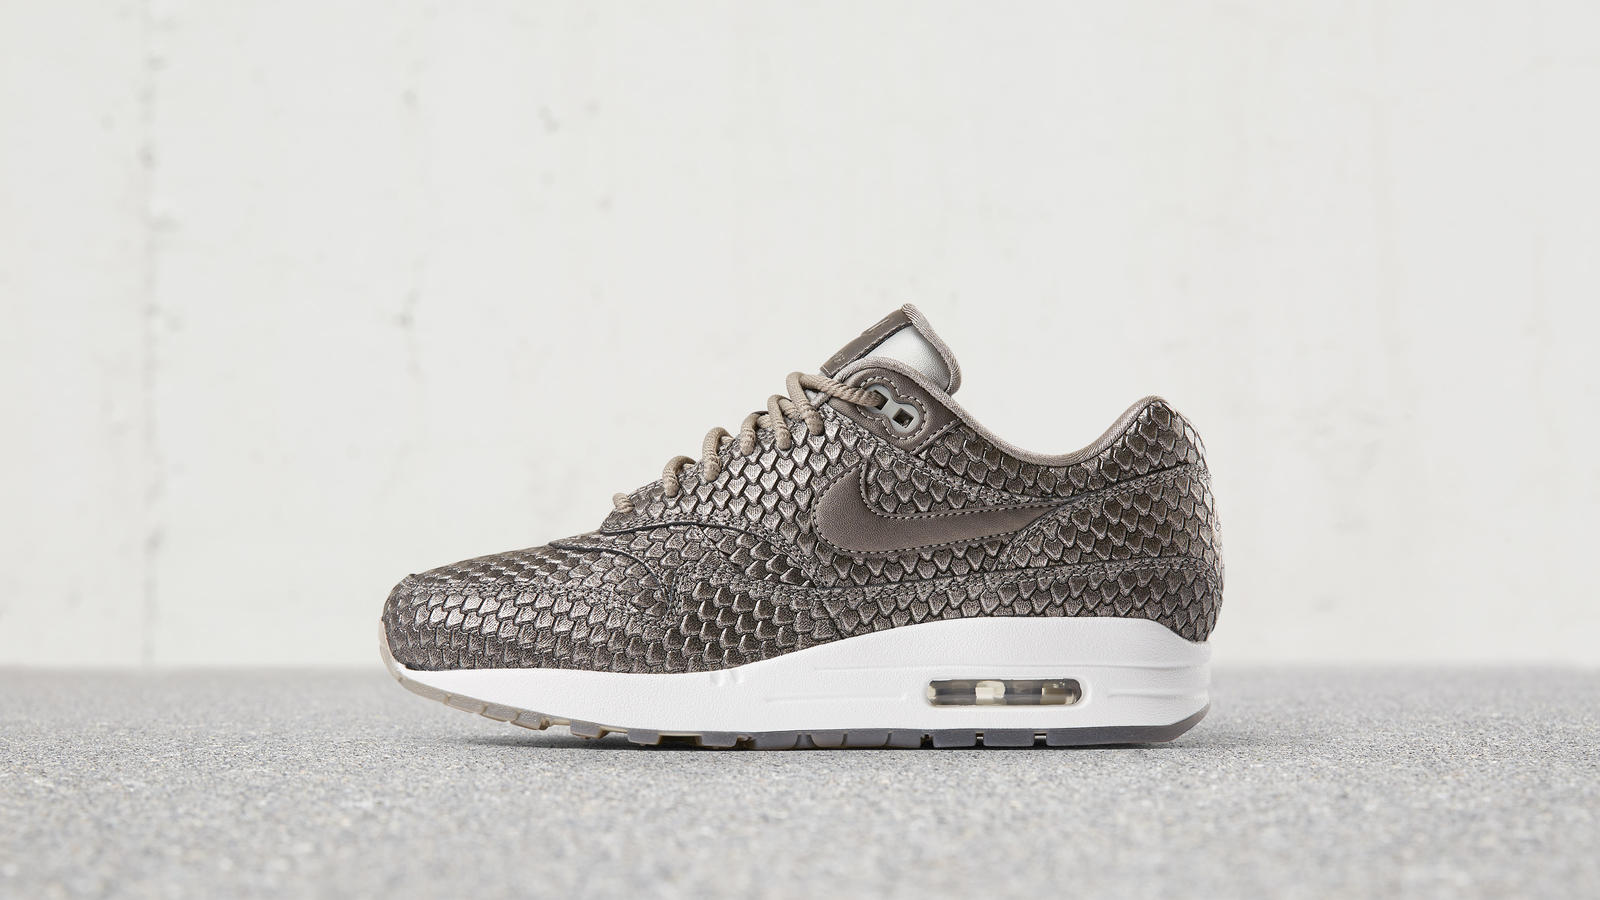 170607 footwear am1 rep silver 0071 hd 1600